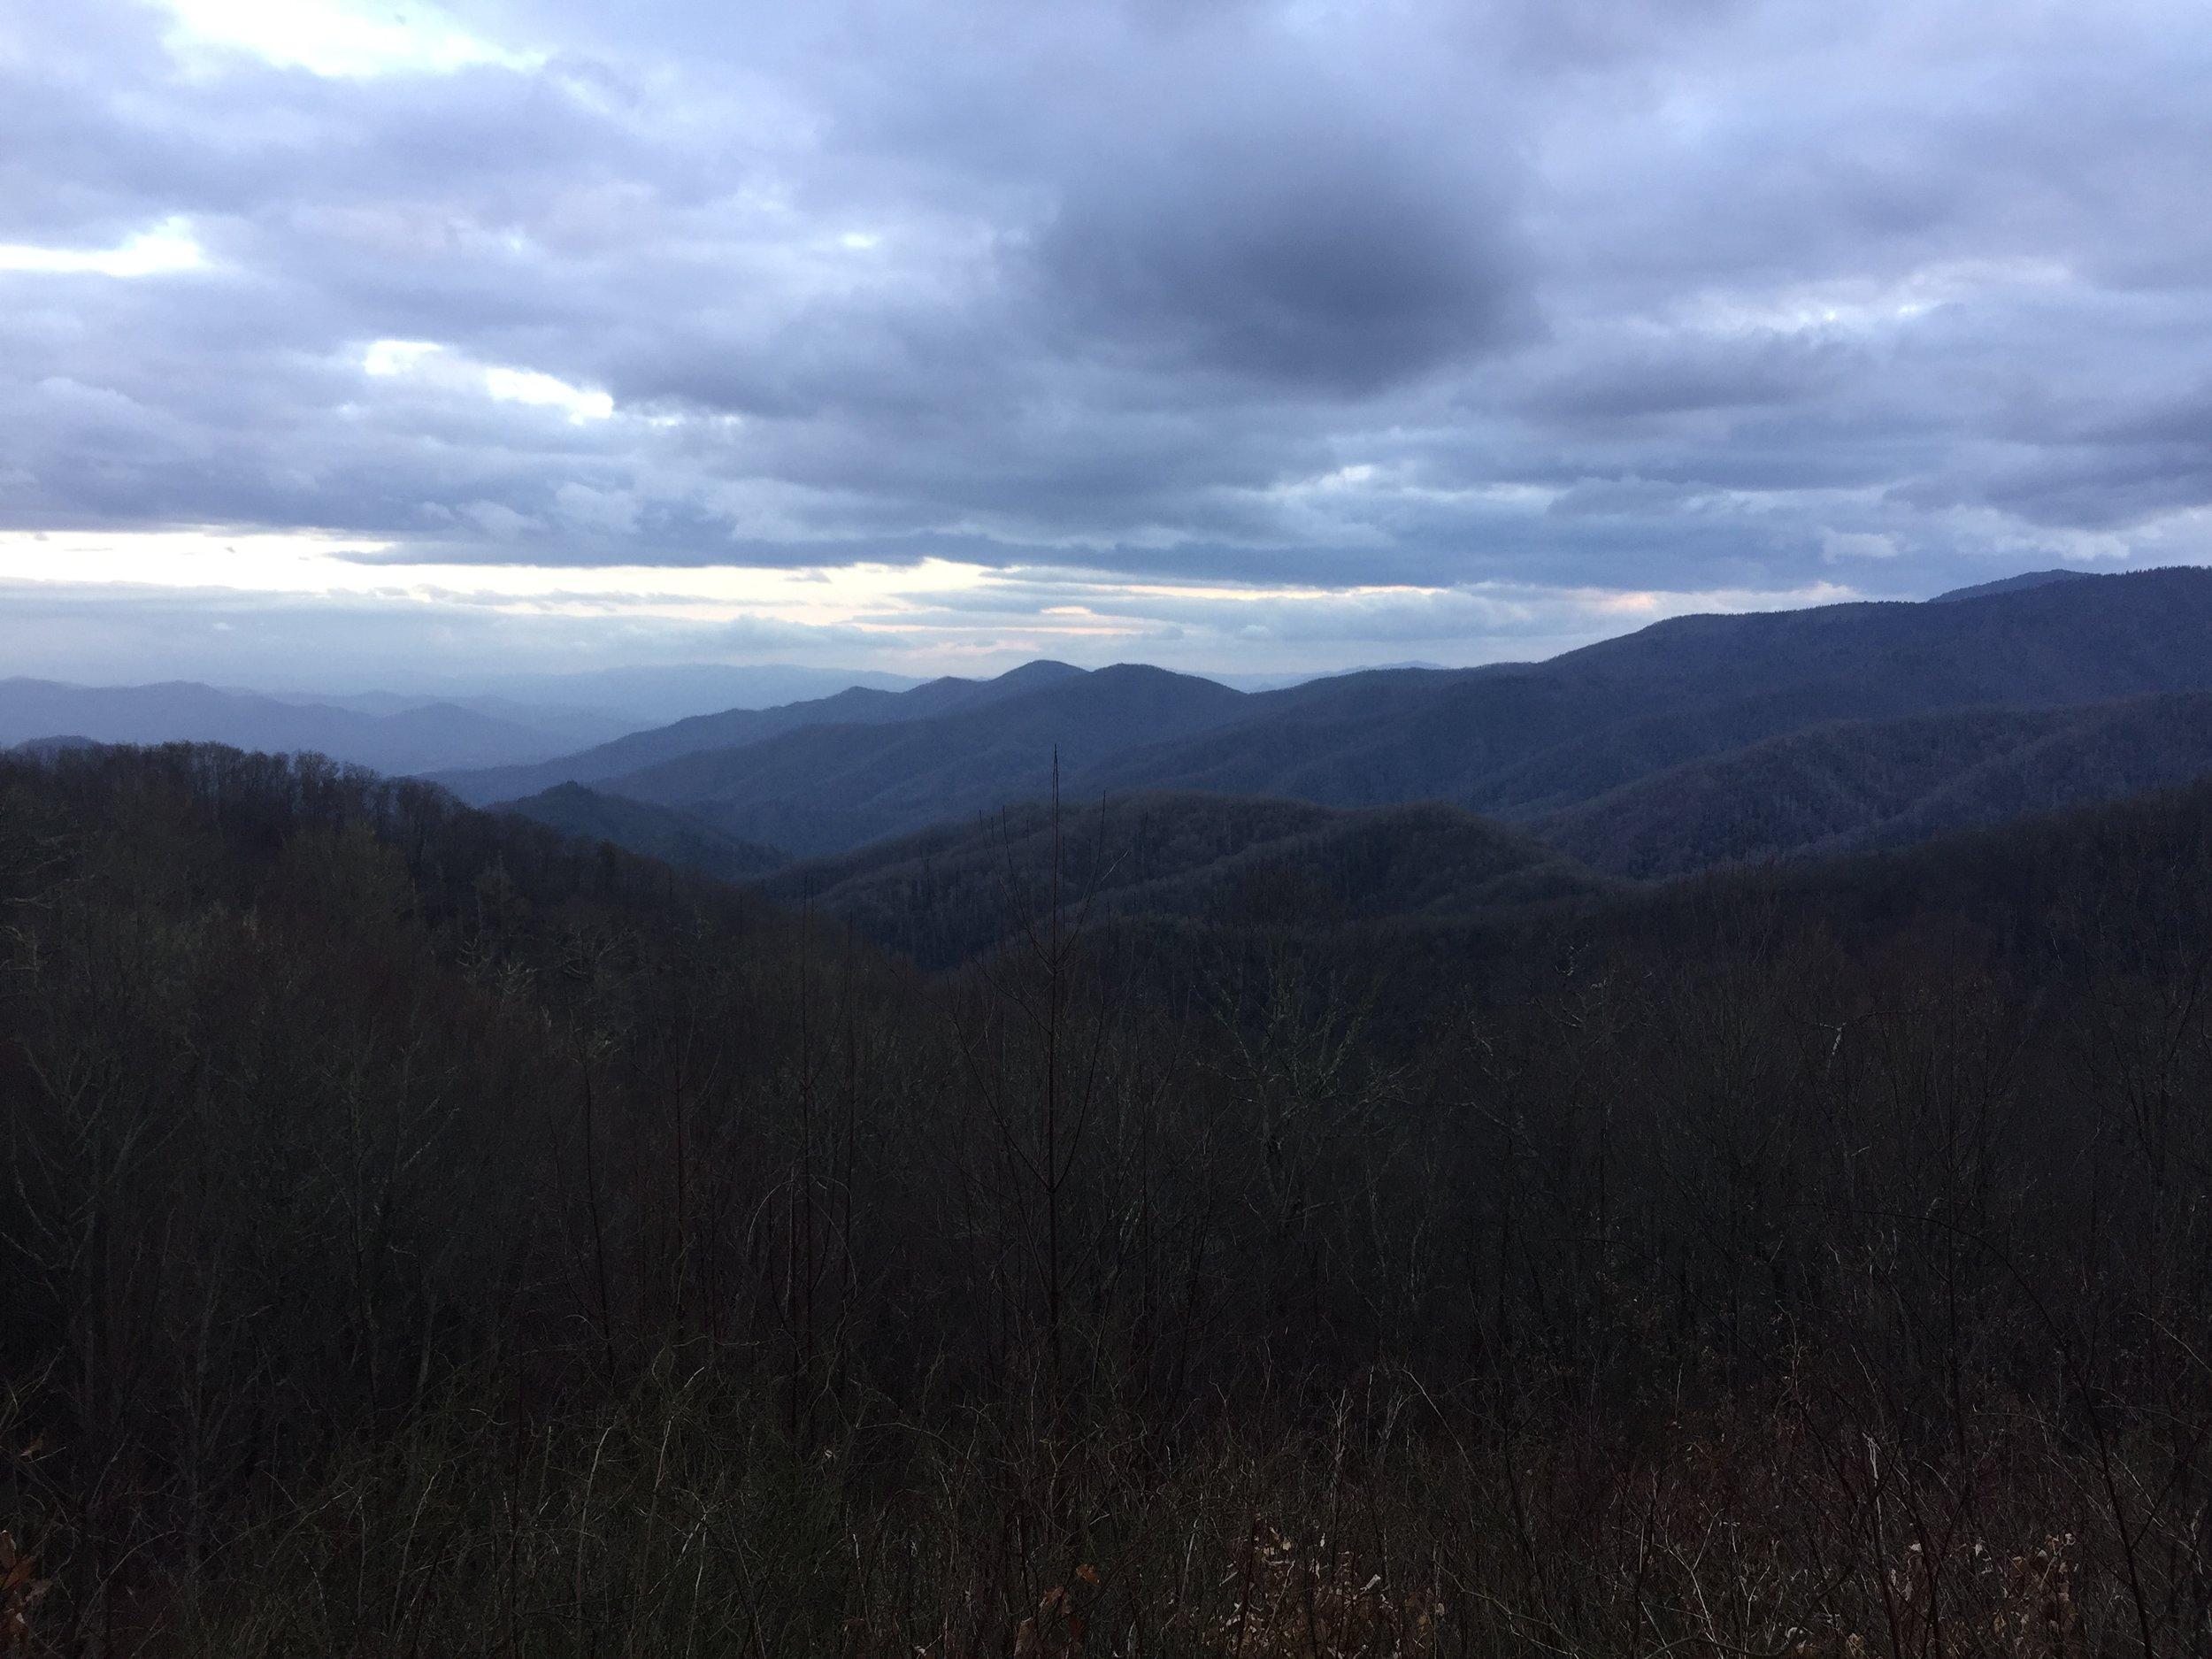 The great smoky mountains, North Carolina